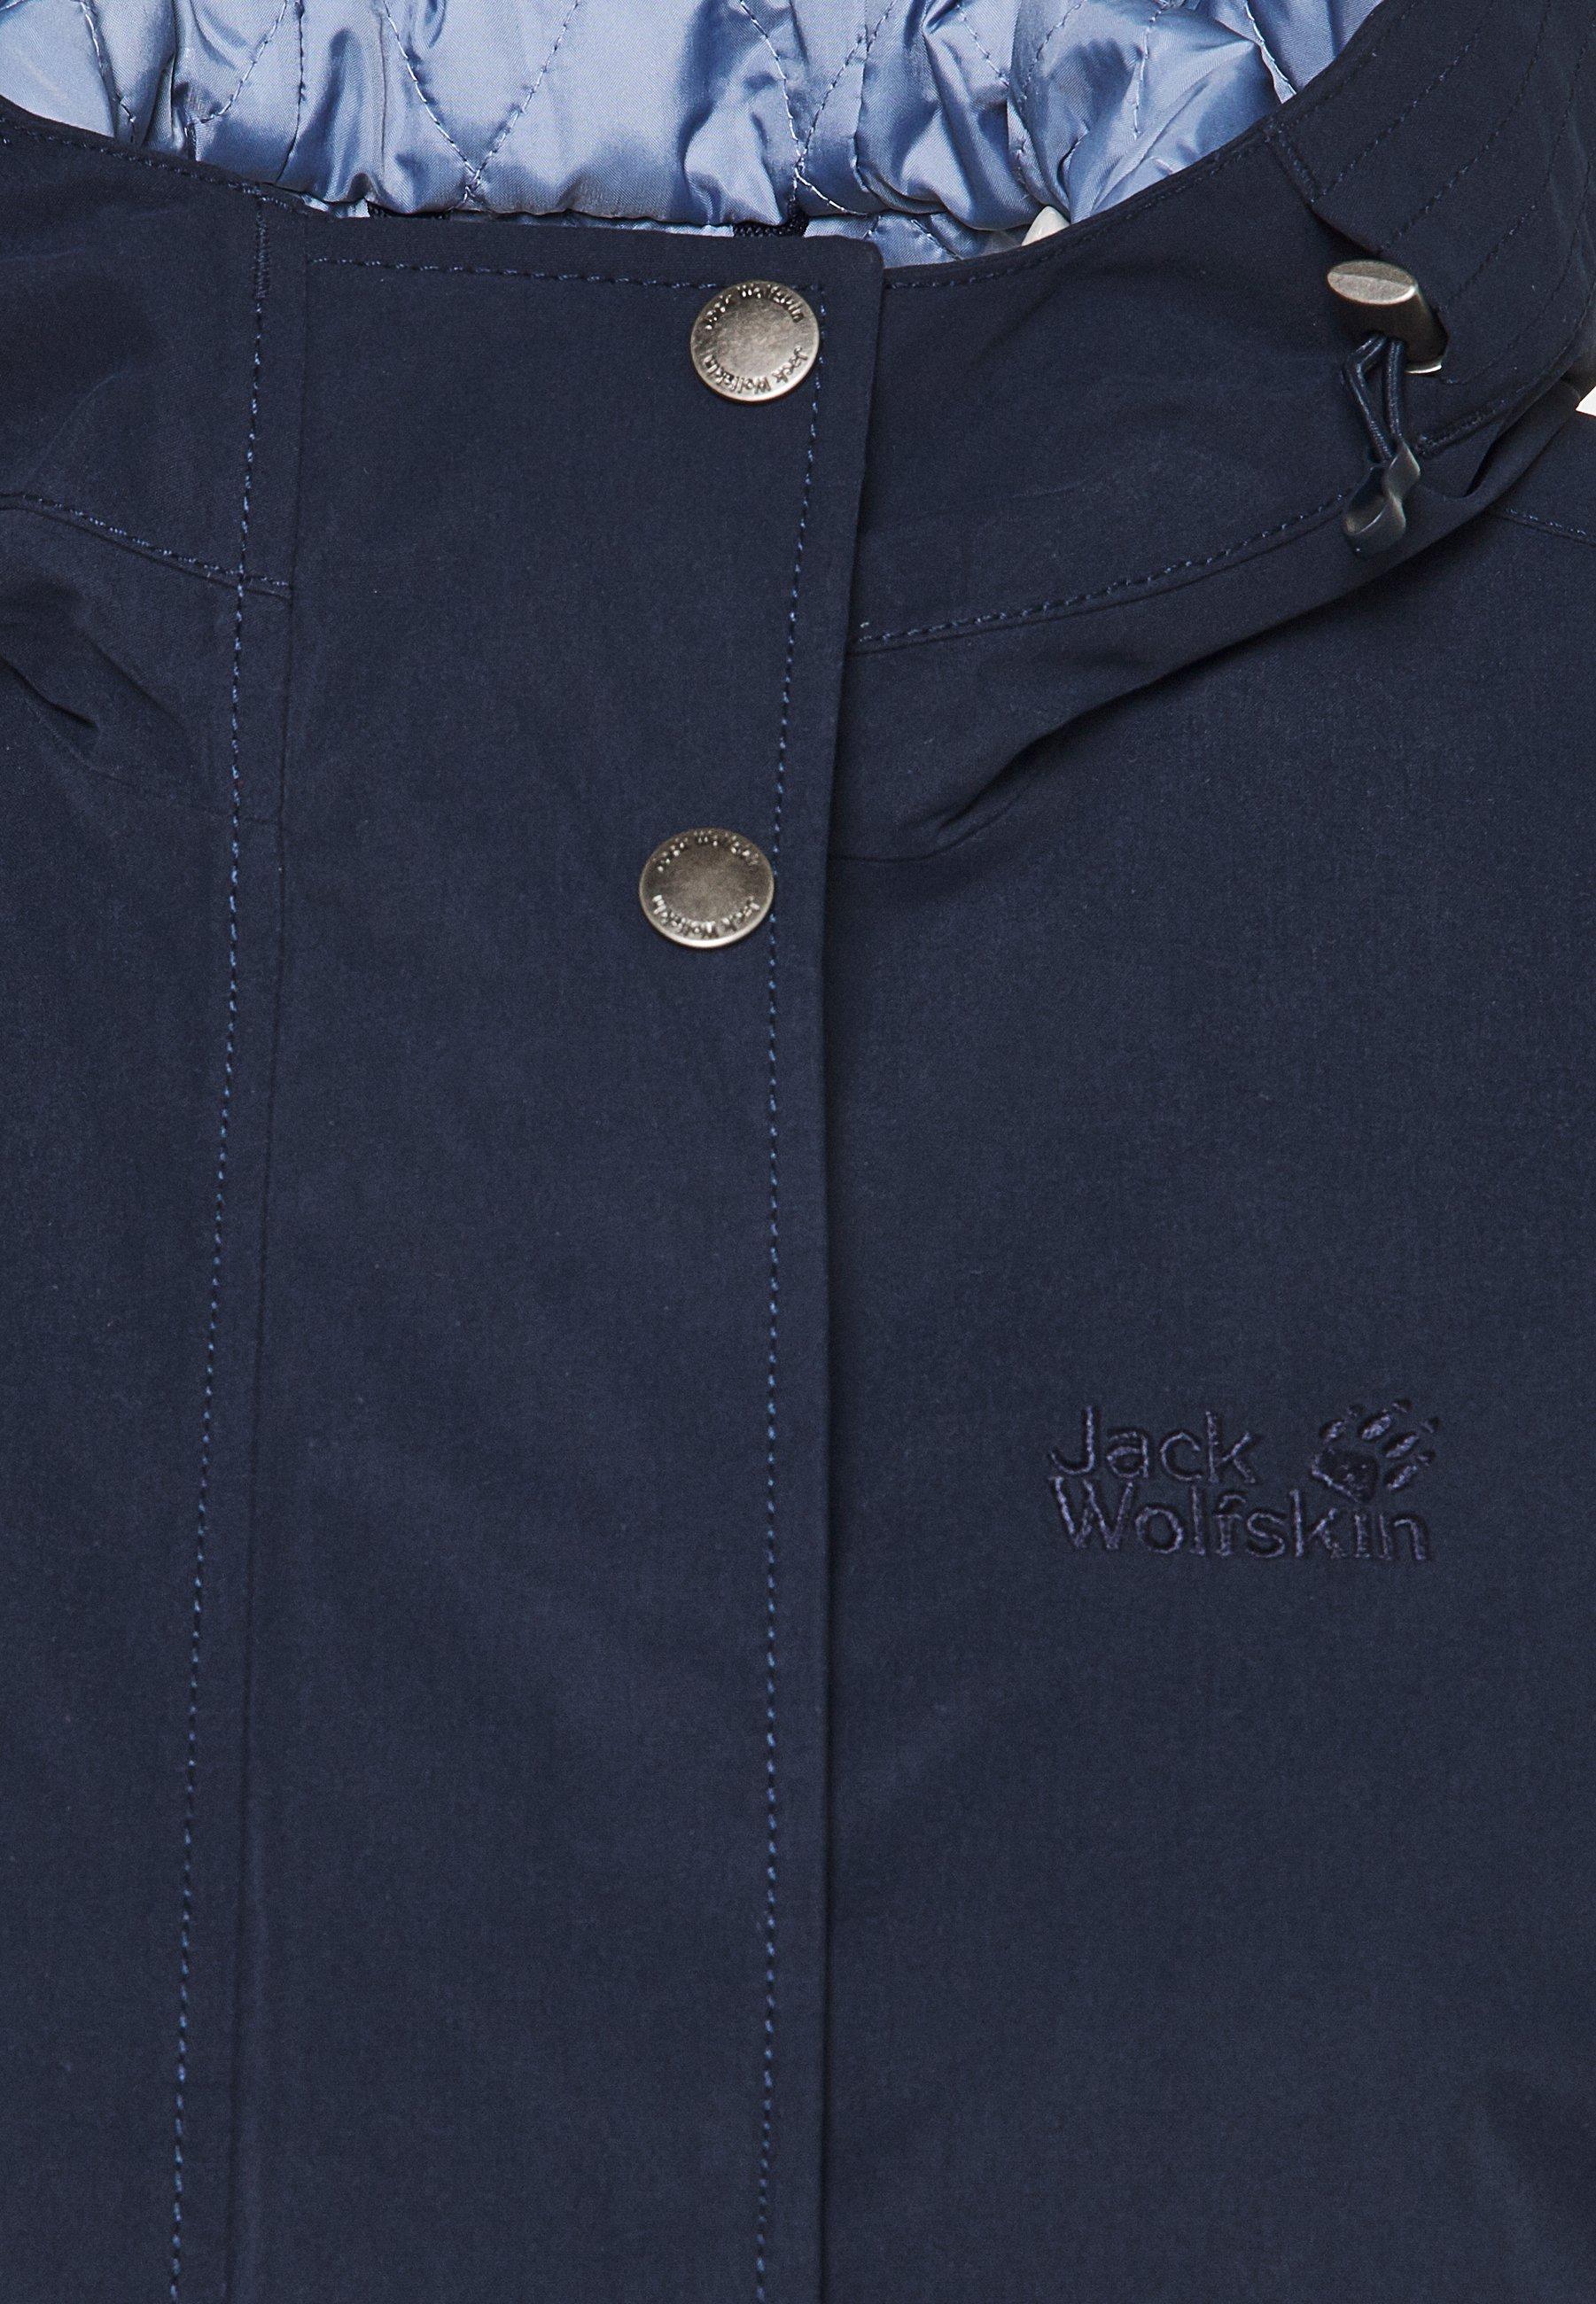 Great Deals Women's Clothing Jack Wolfskin LAKE LOUISE JACKET Parka midnight blue MVDJveMlR